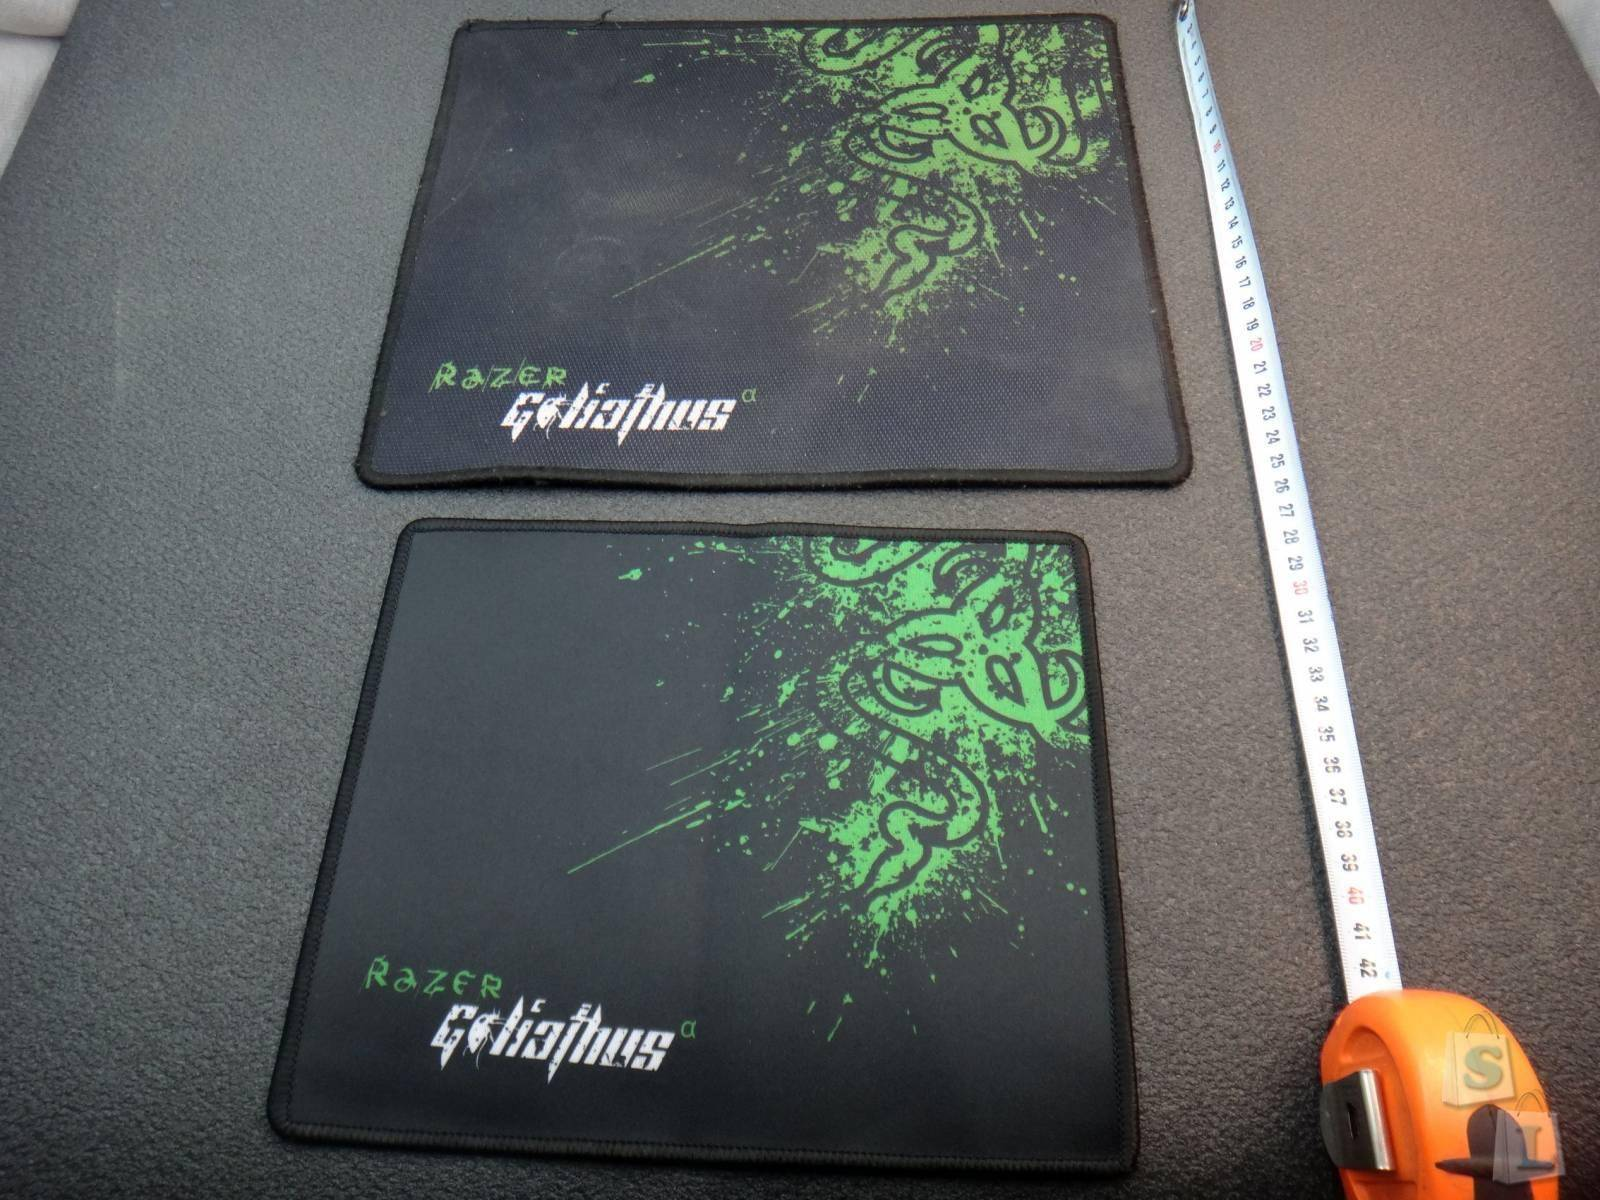 Aliexpress: Коврик для мышки Azer Goliath сравнение с оригиналом Razer Goliathus